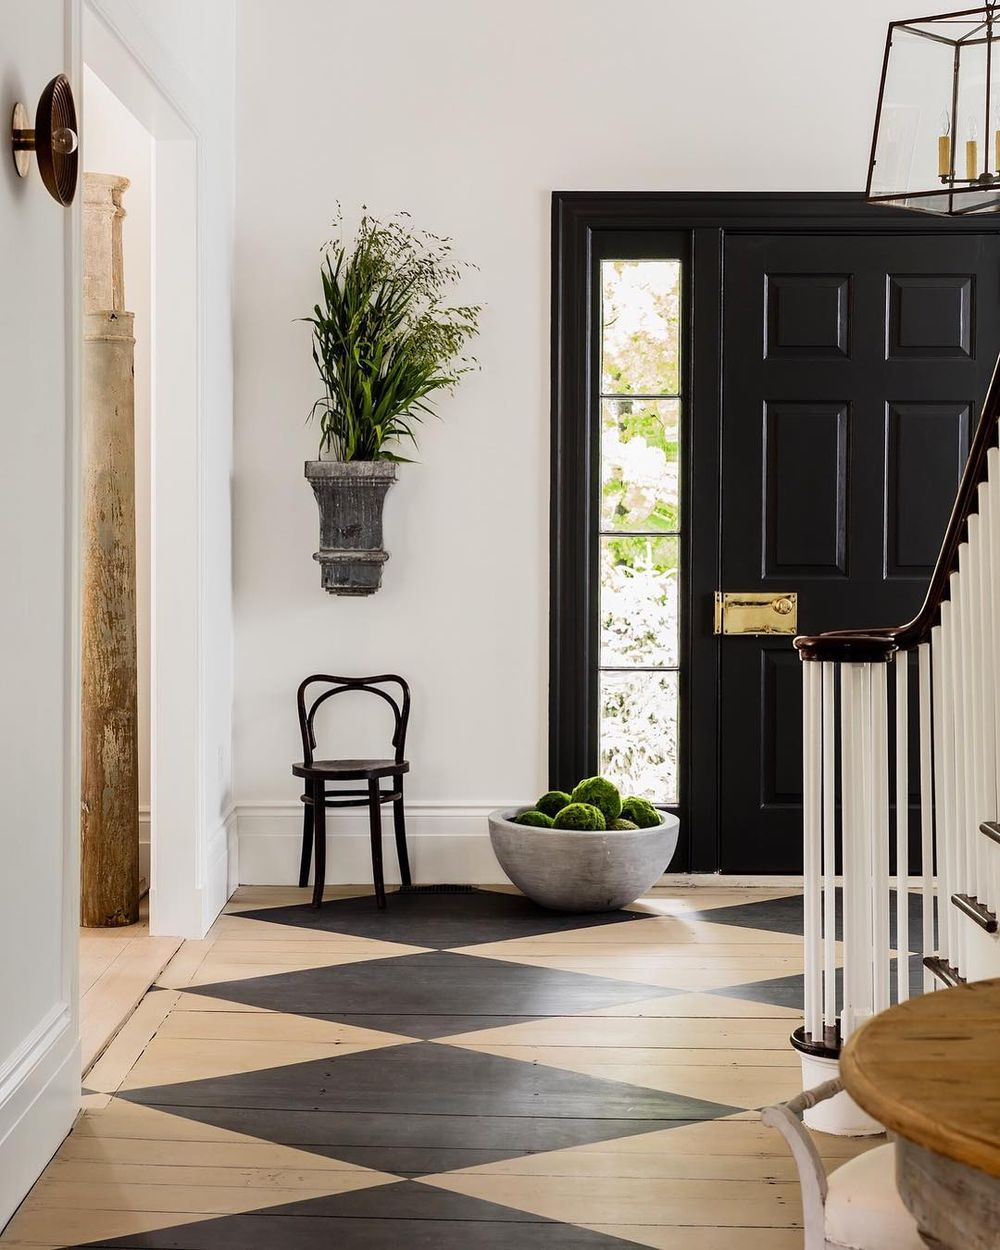 Scandinavian Entryway: 7 Black And White Checkered Floors Decor Ideas